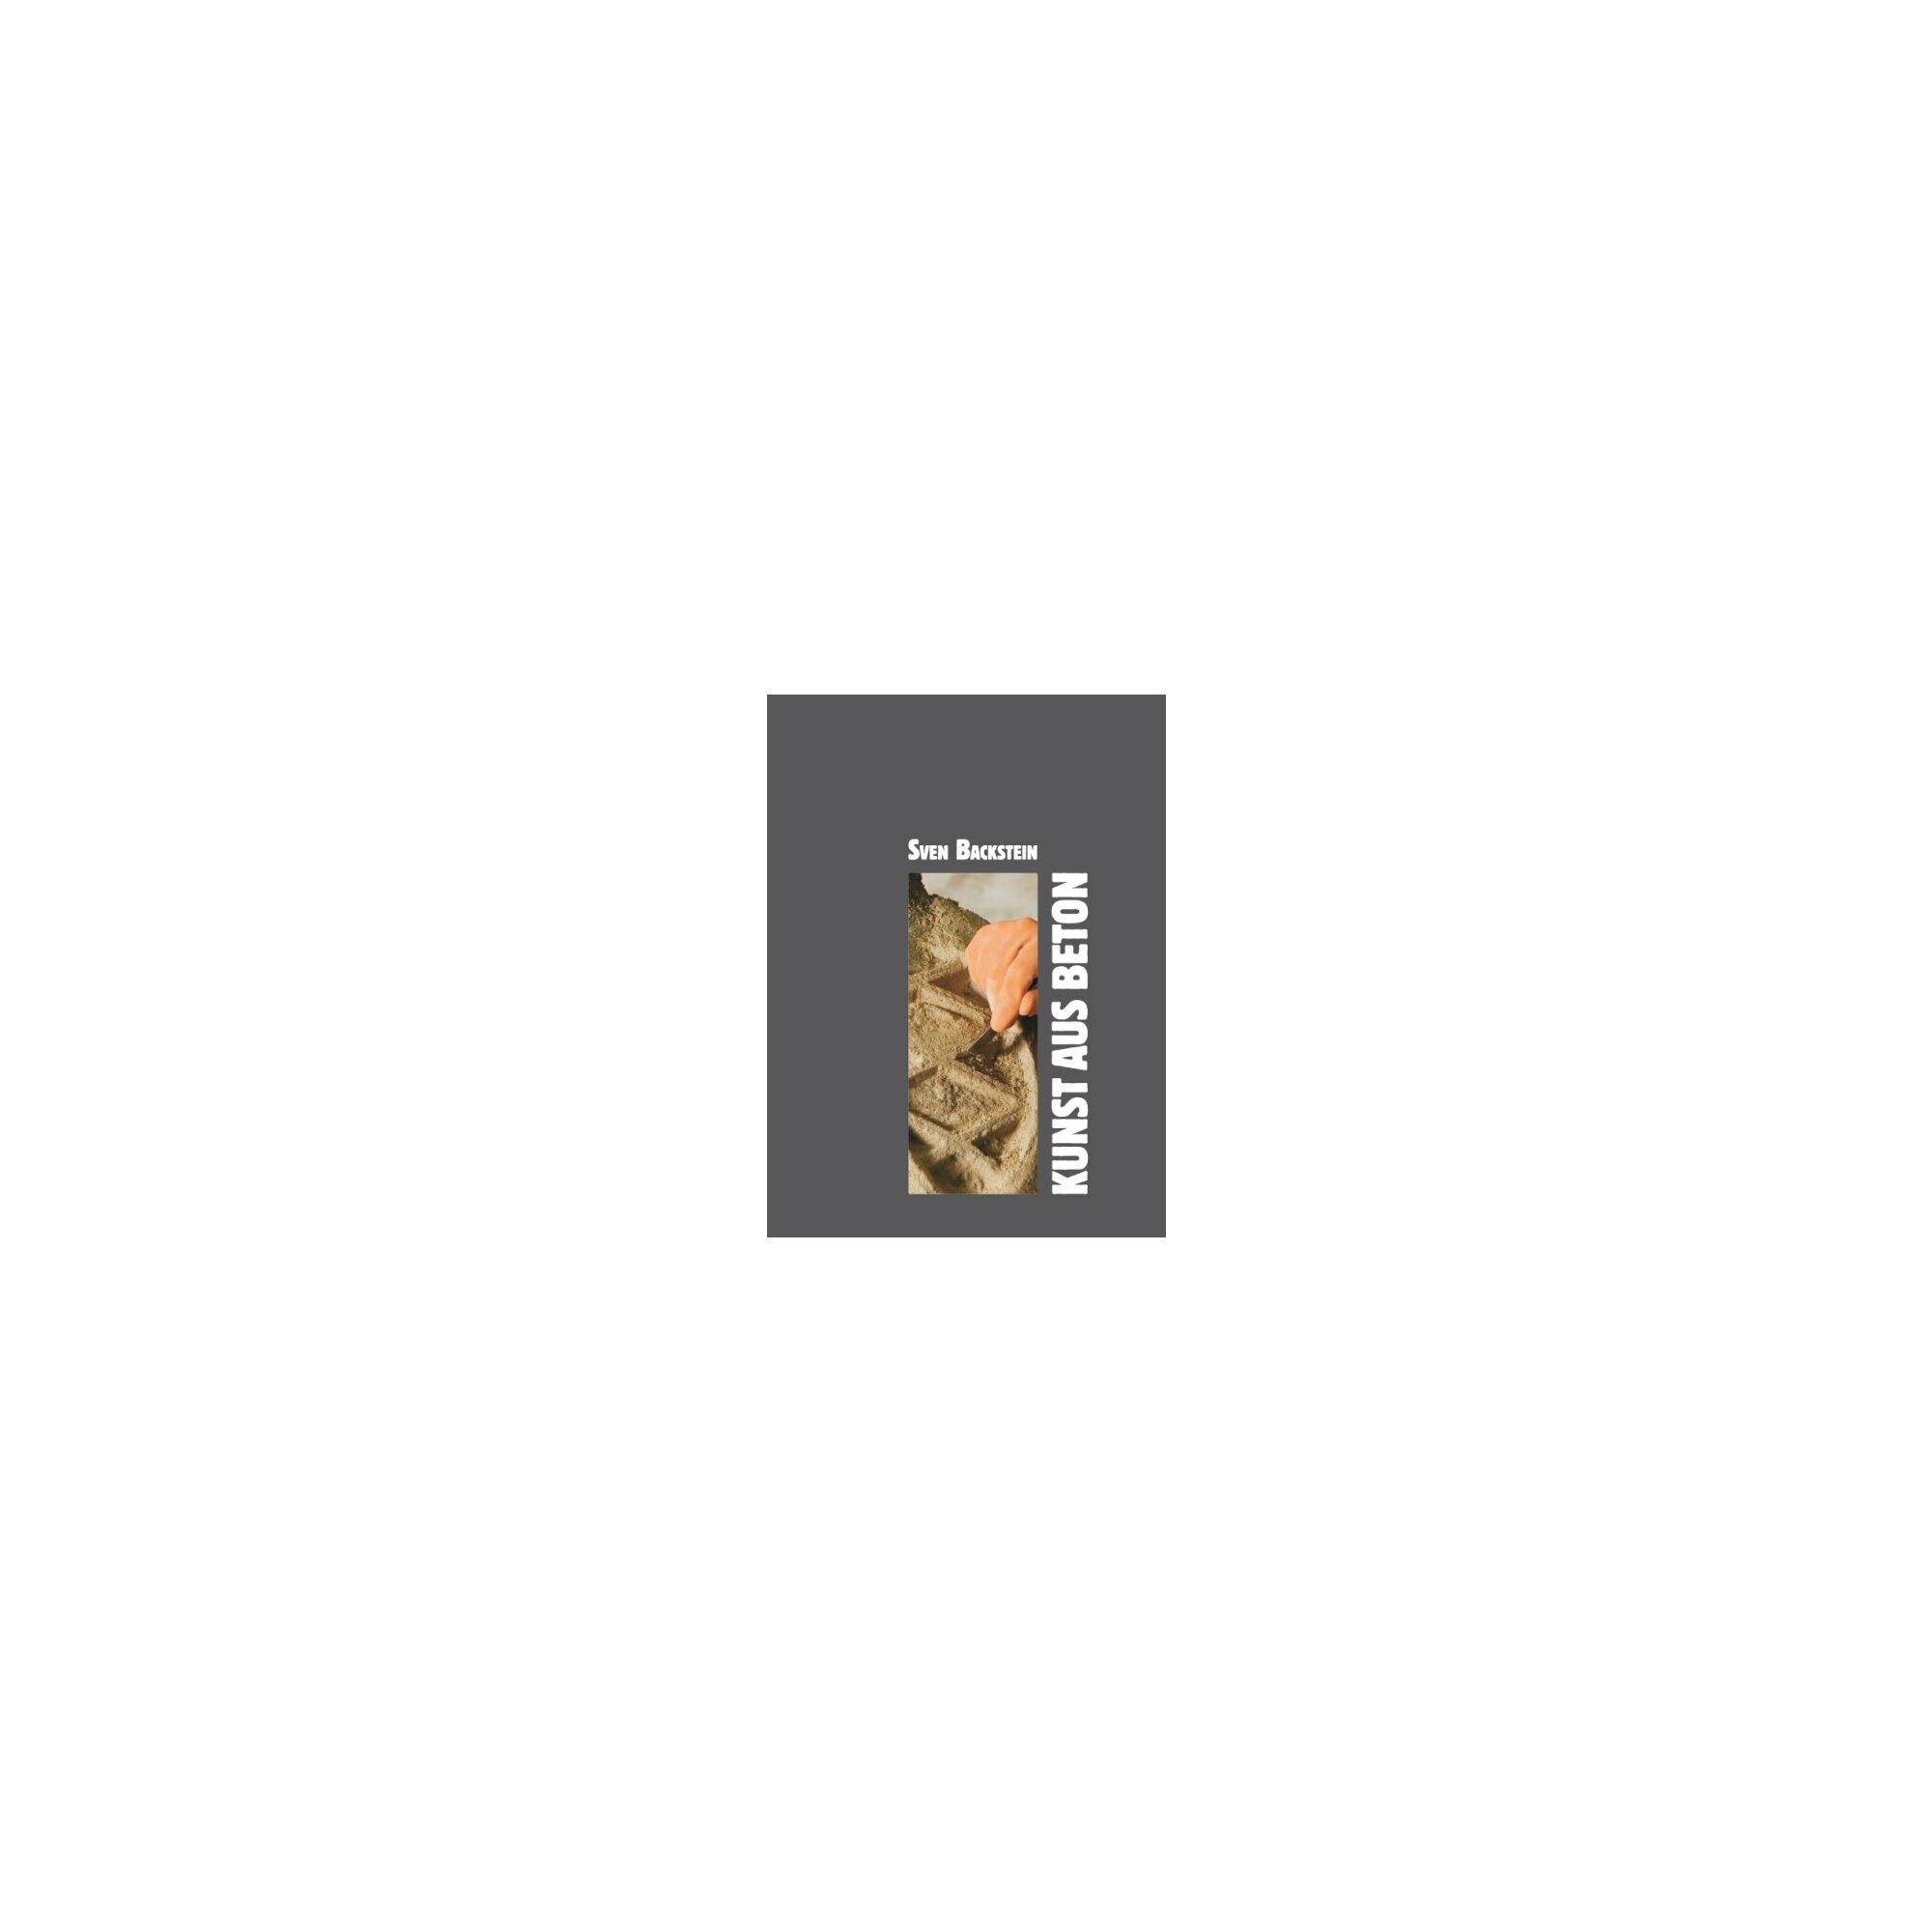 sven backstein kunst aus beton isbn 978 3 00 028982 8 m rtelshop 58 80 chf. Black Bedroom Furniture Sets. Home Design Ideas